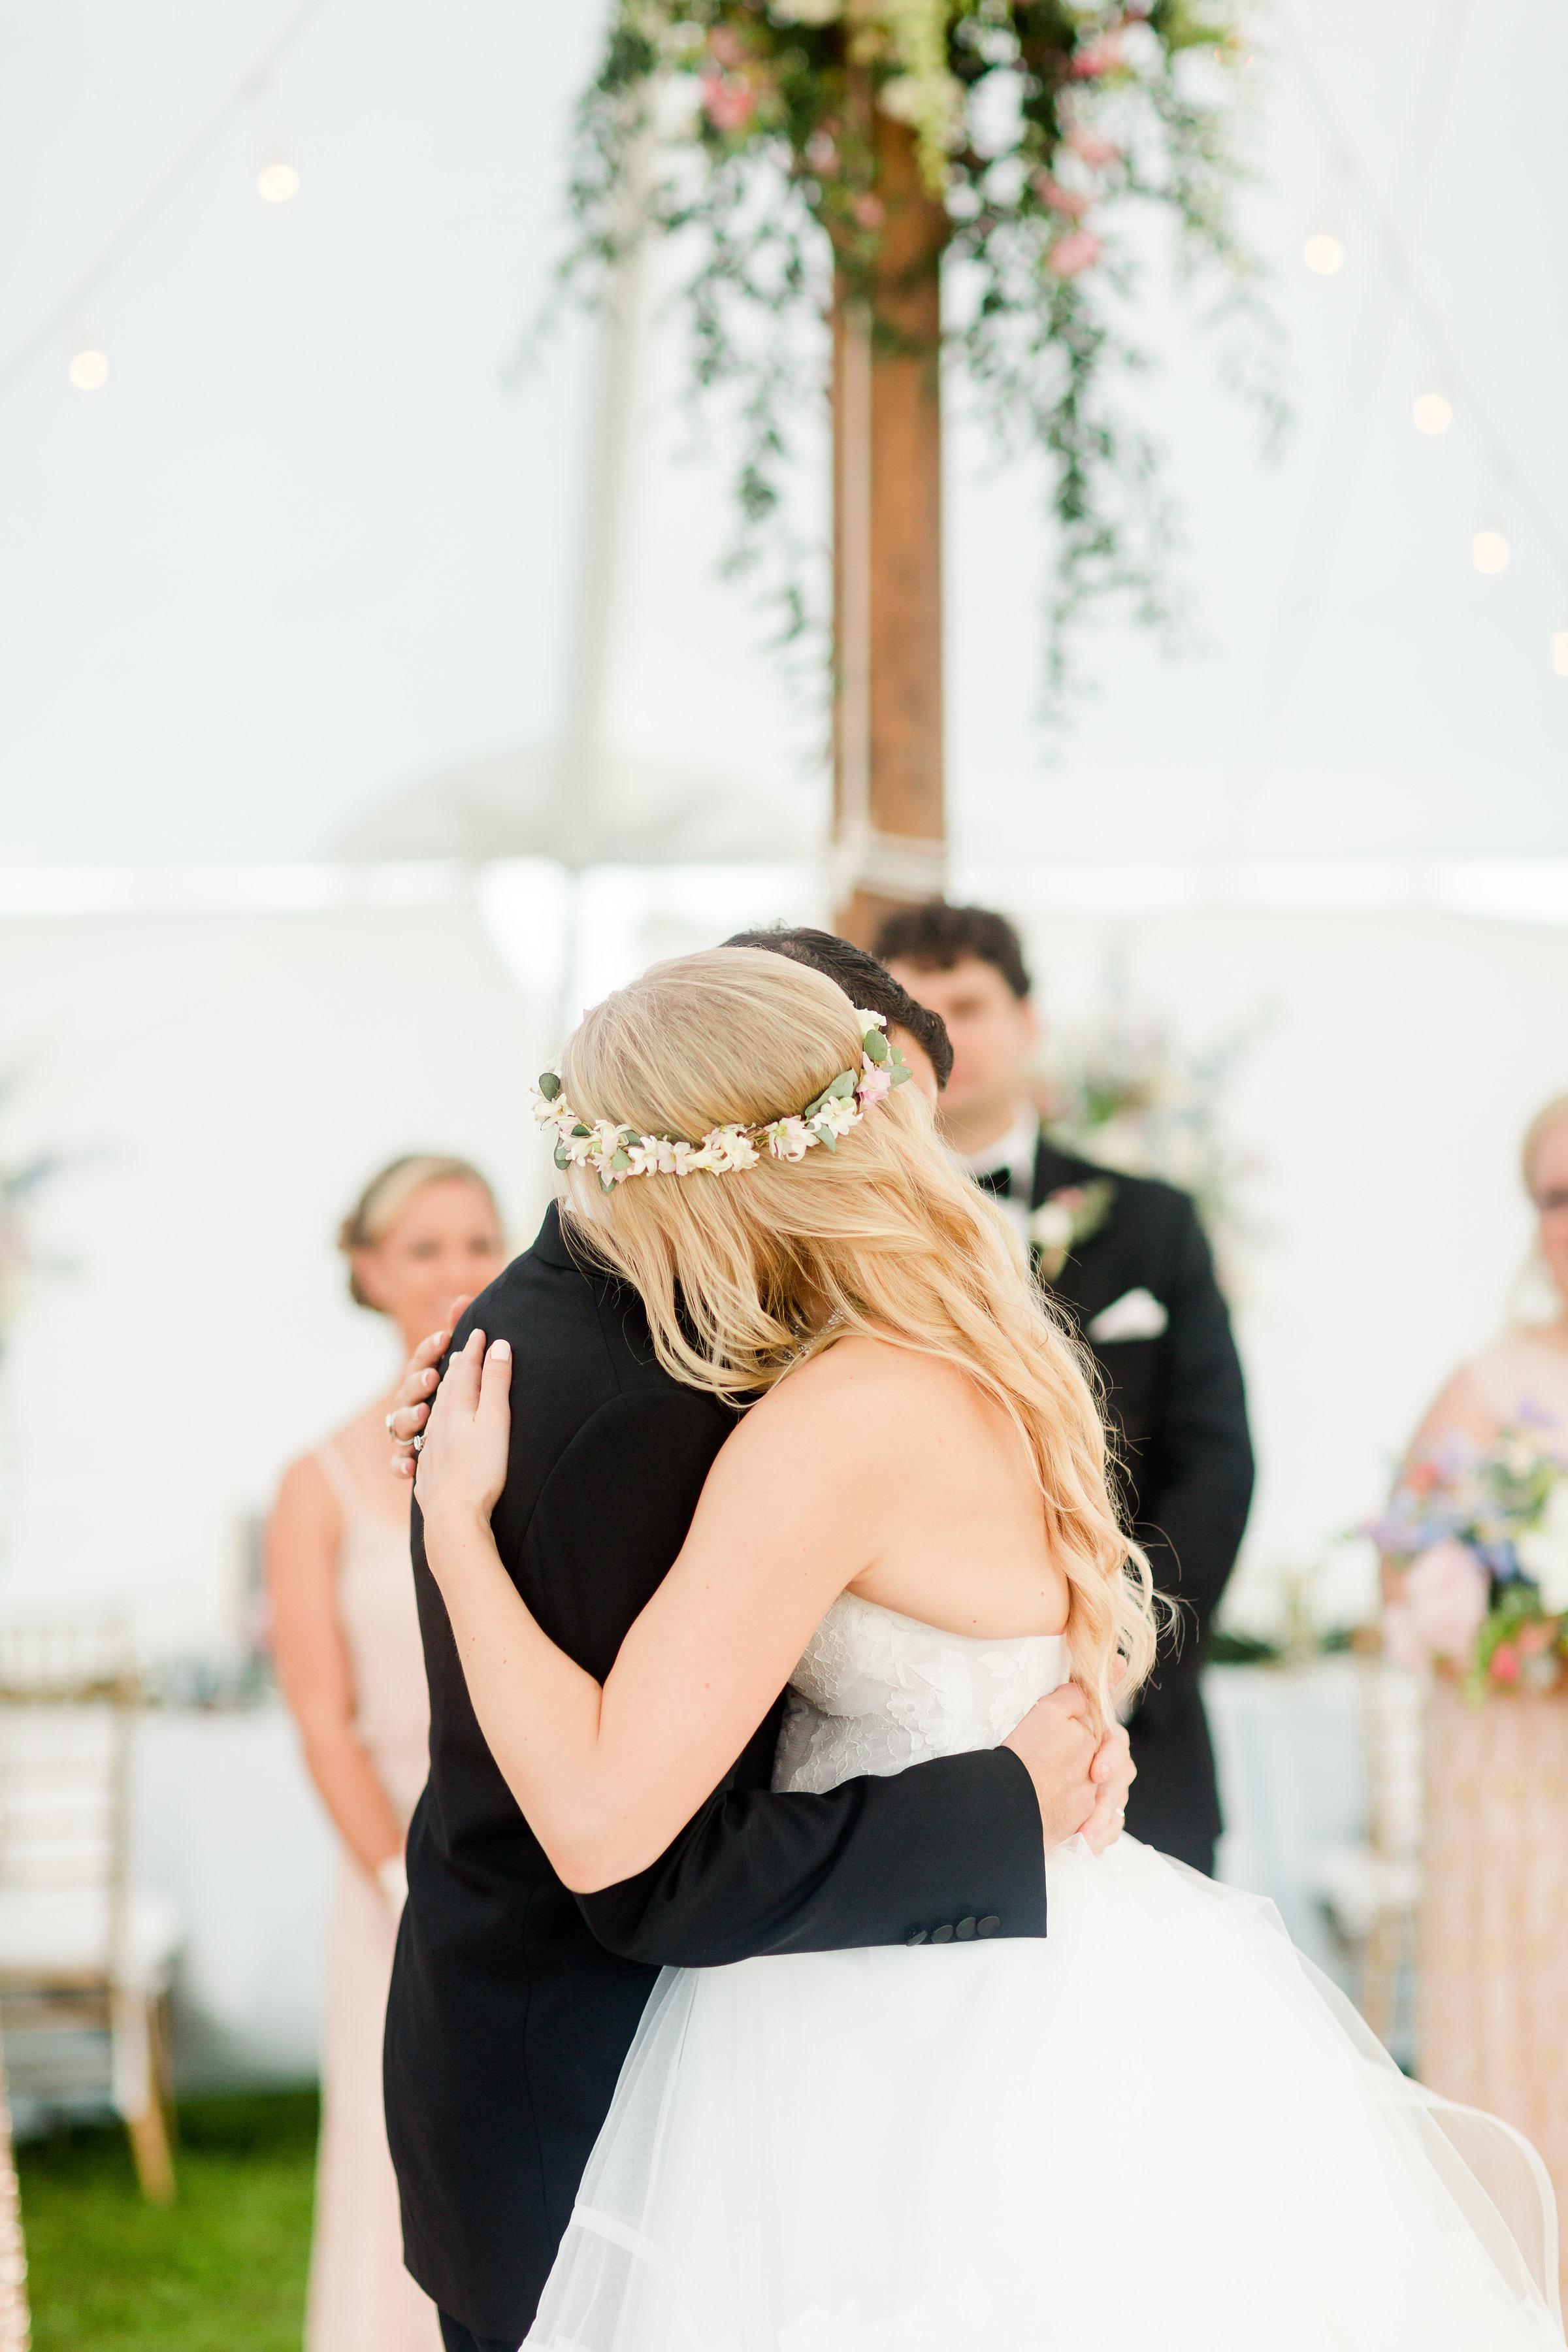 NJ Wedding, Tent Wedding, Flower Crown